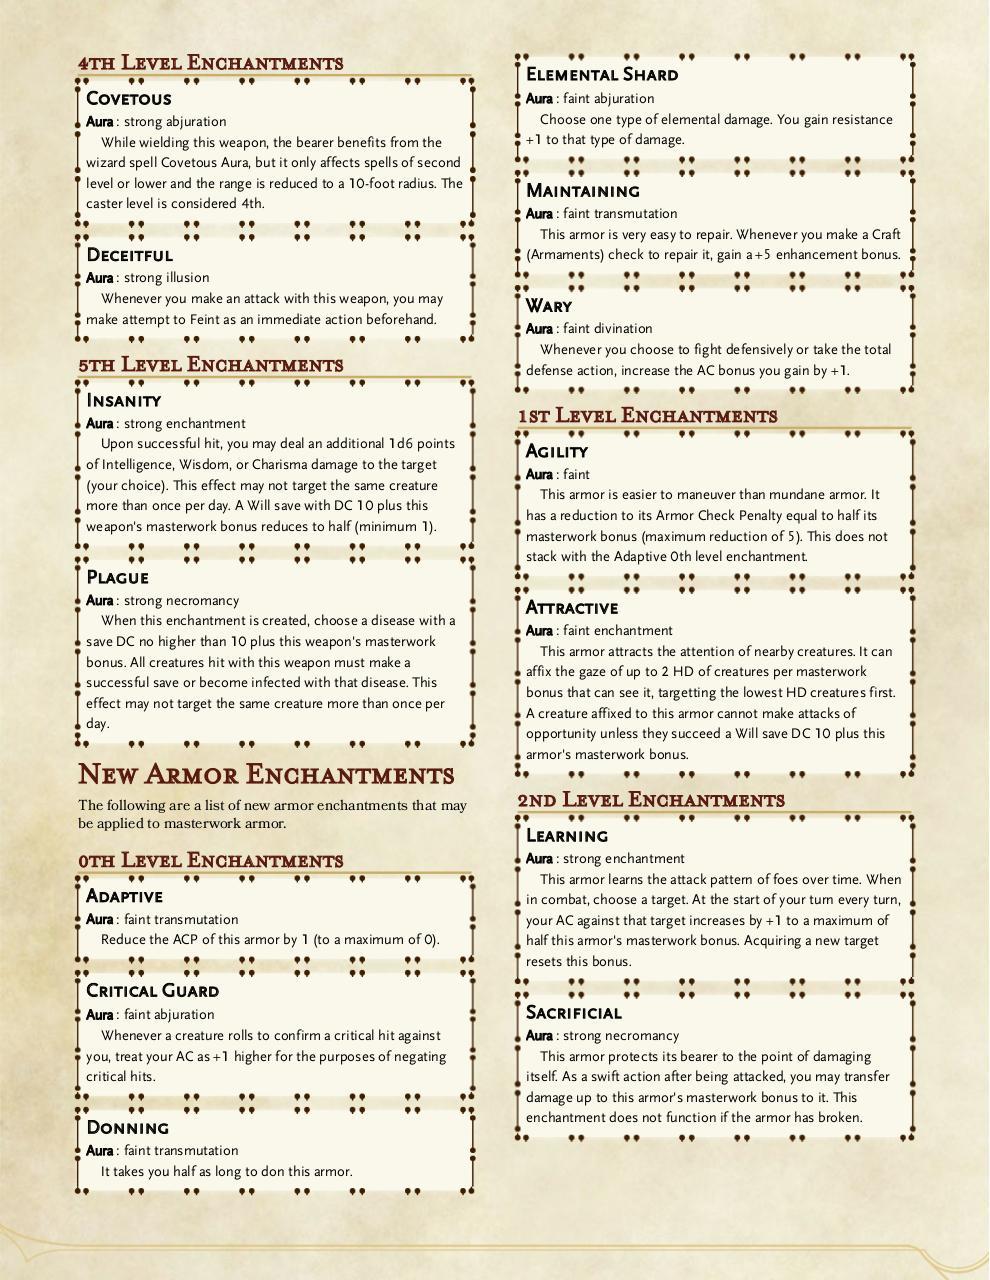 Masterwork Armaments 2 - PDF Archive